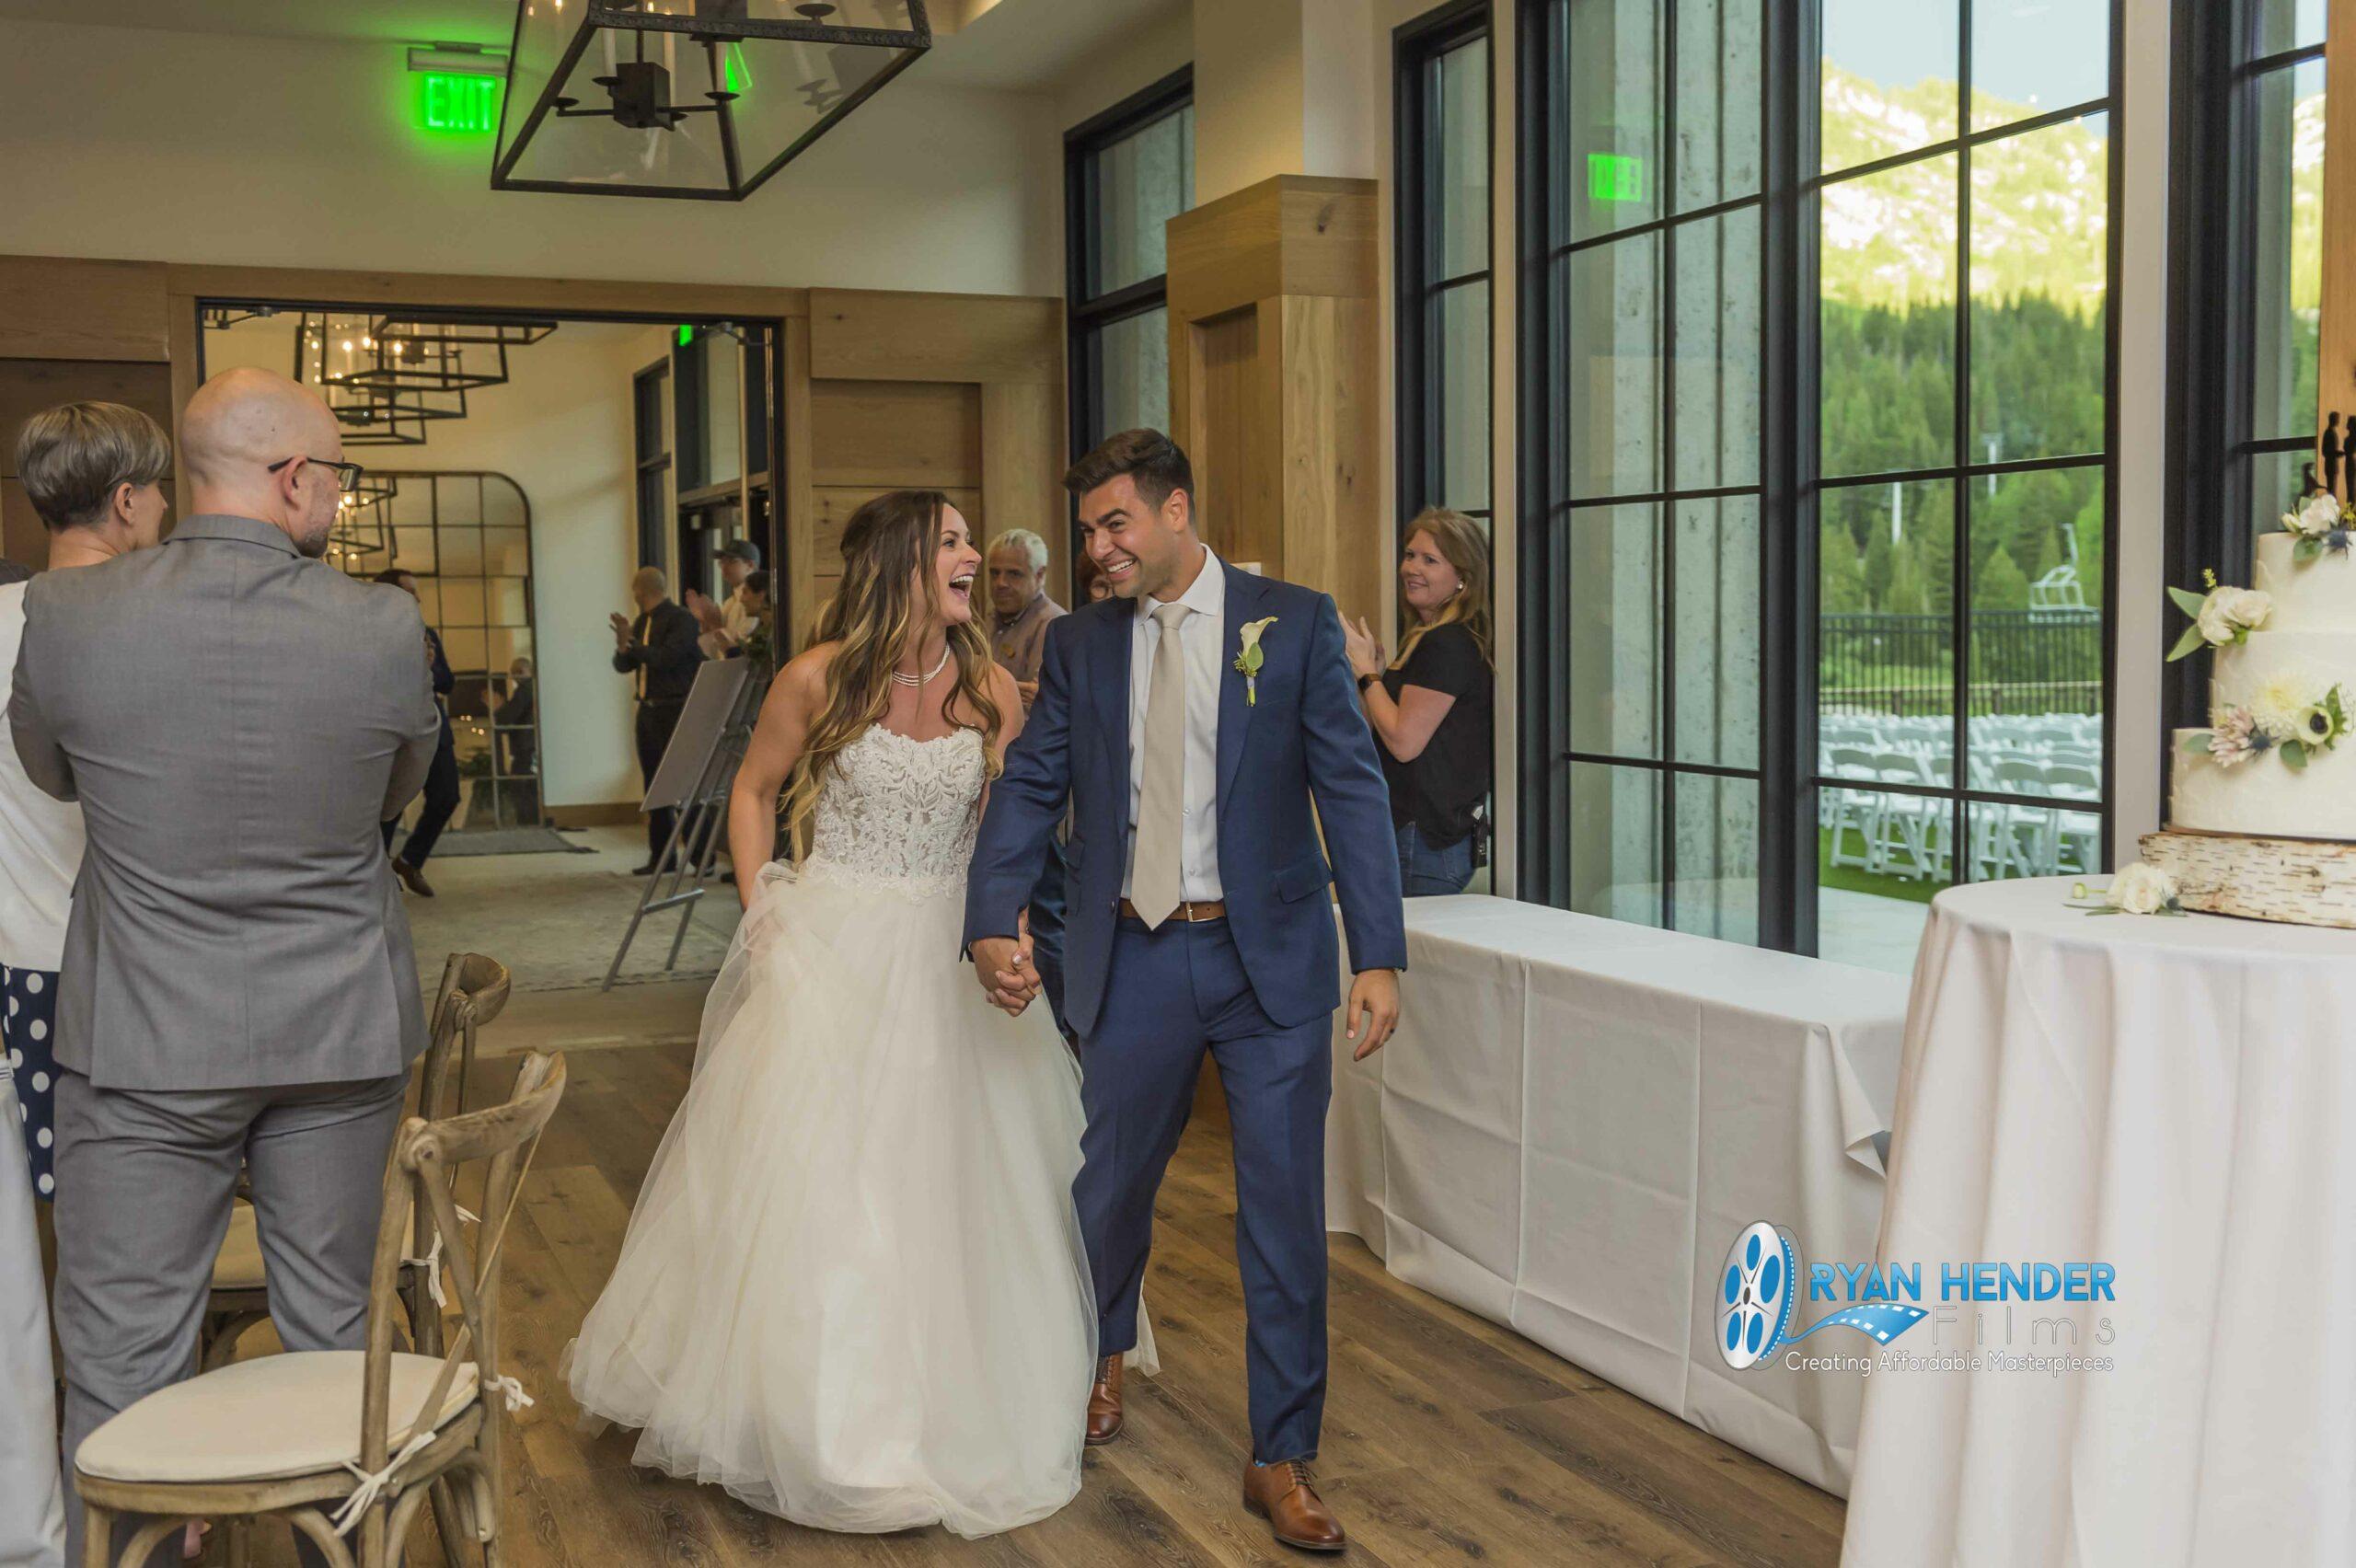 Snowpine Lodge Wedding Venue | Kaylee + Andrew